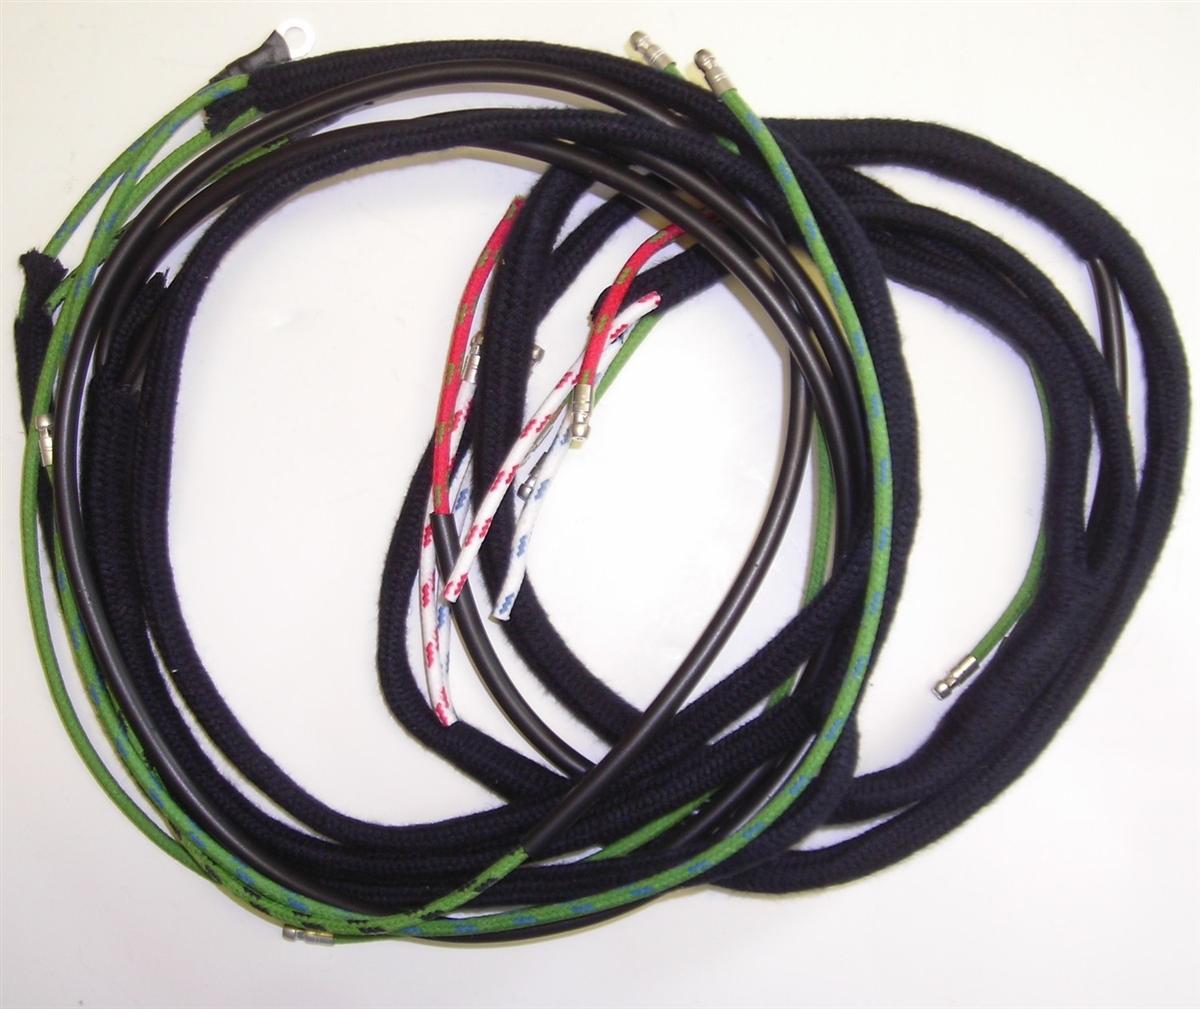 jaguar xk140 automatic gearbox wiring harness (192bb) Radio Wiring Harness Diagram